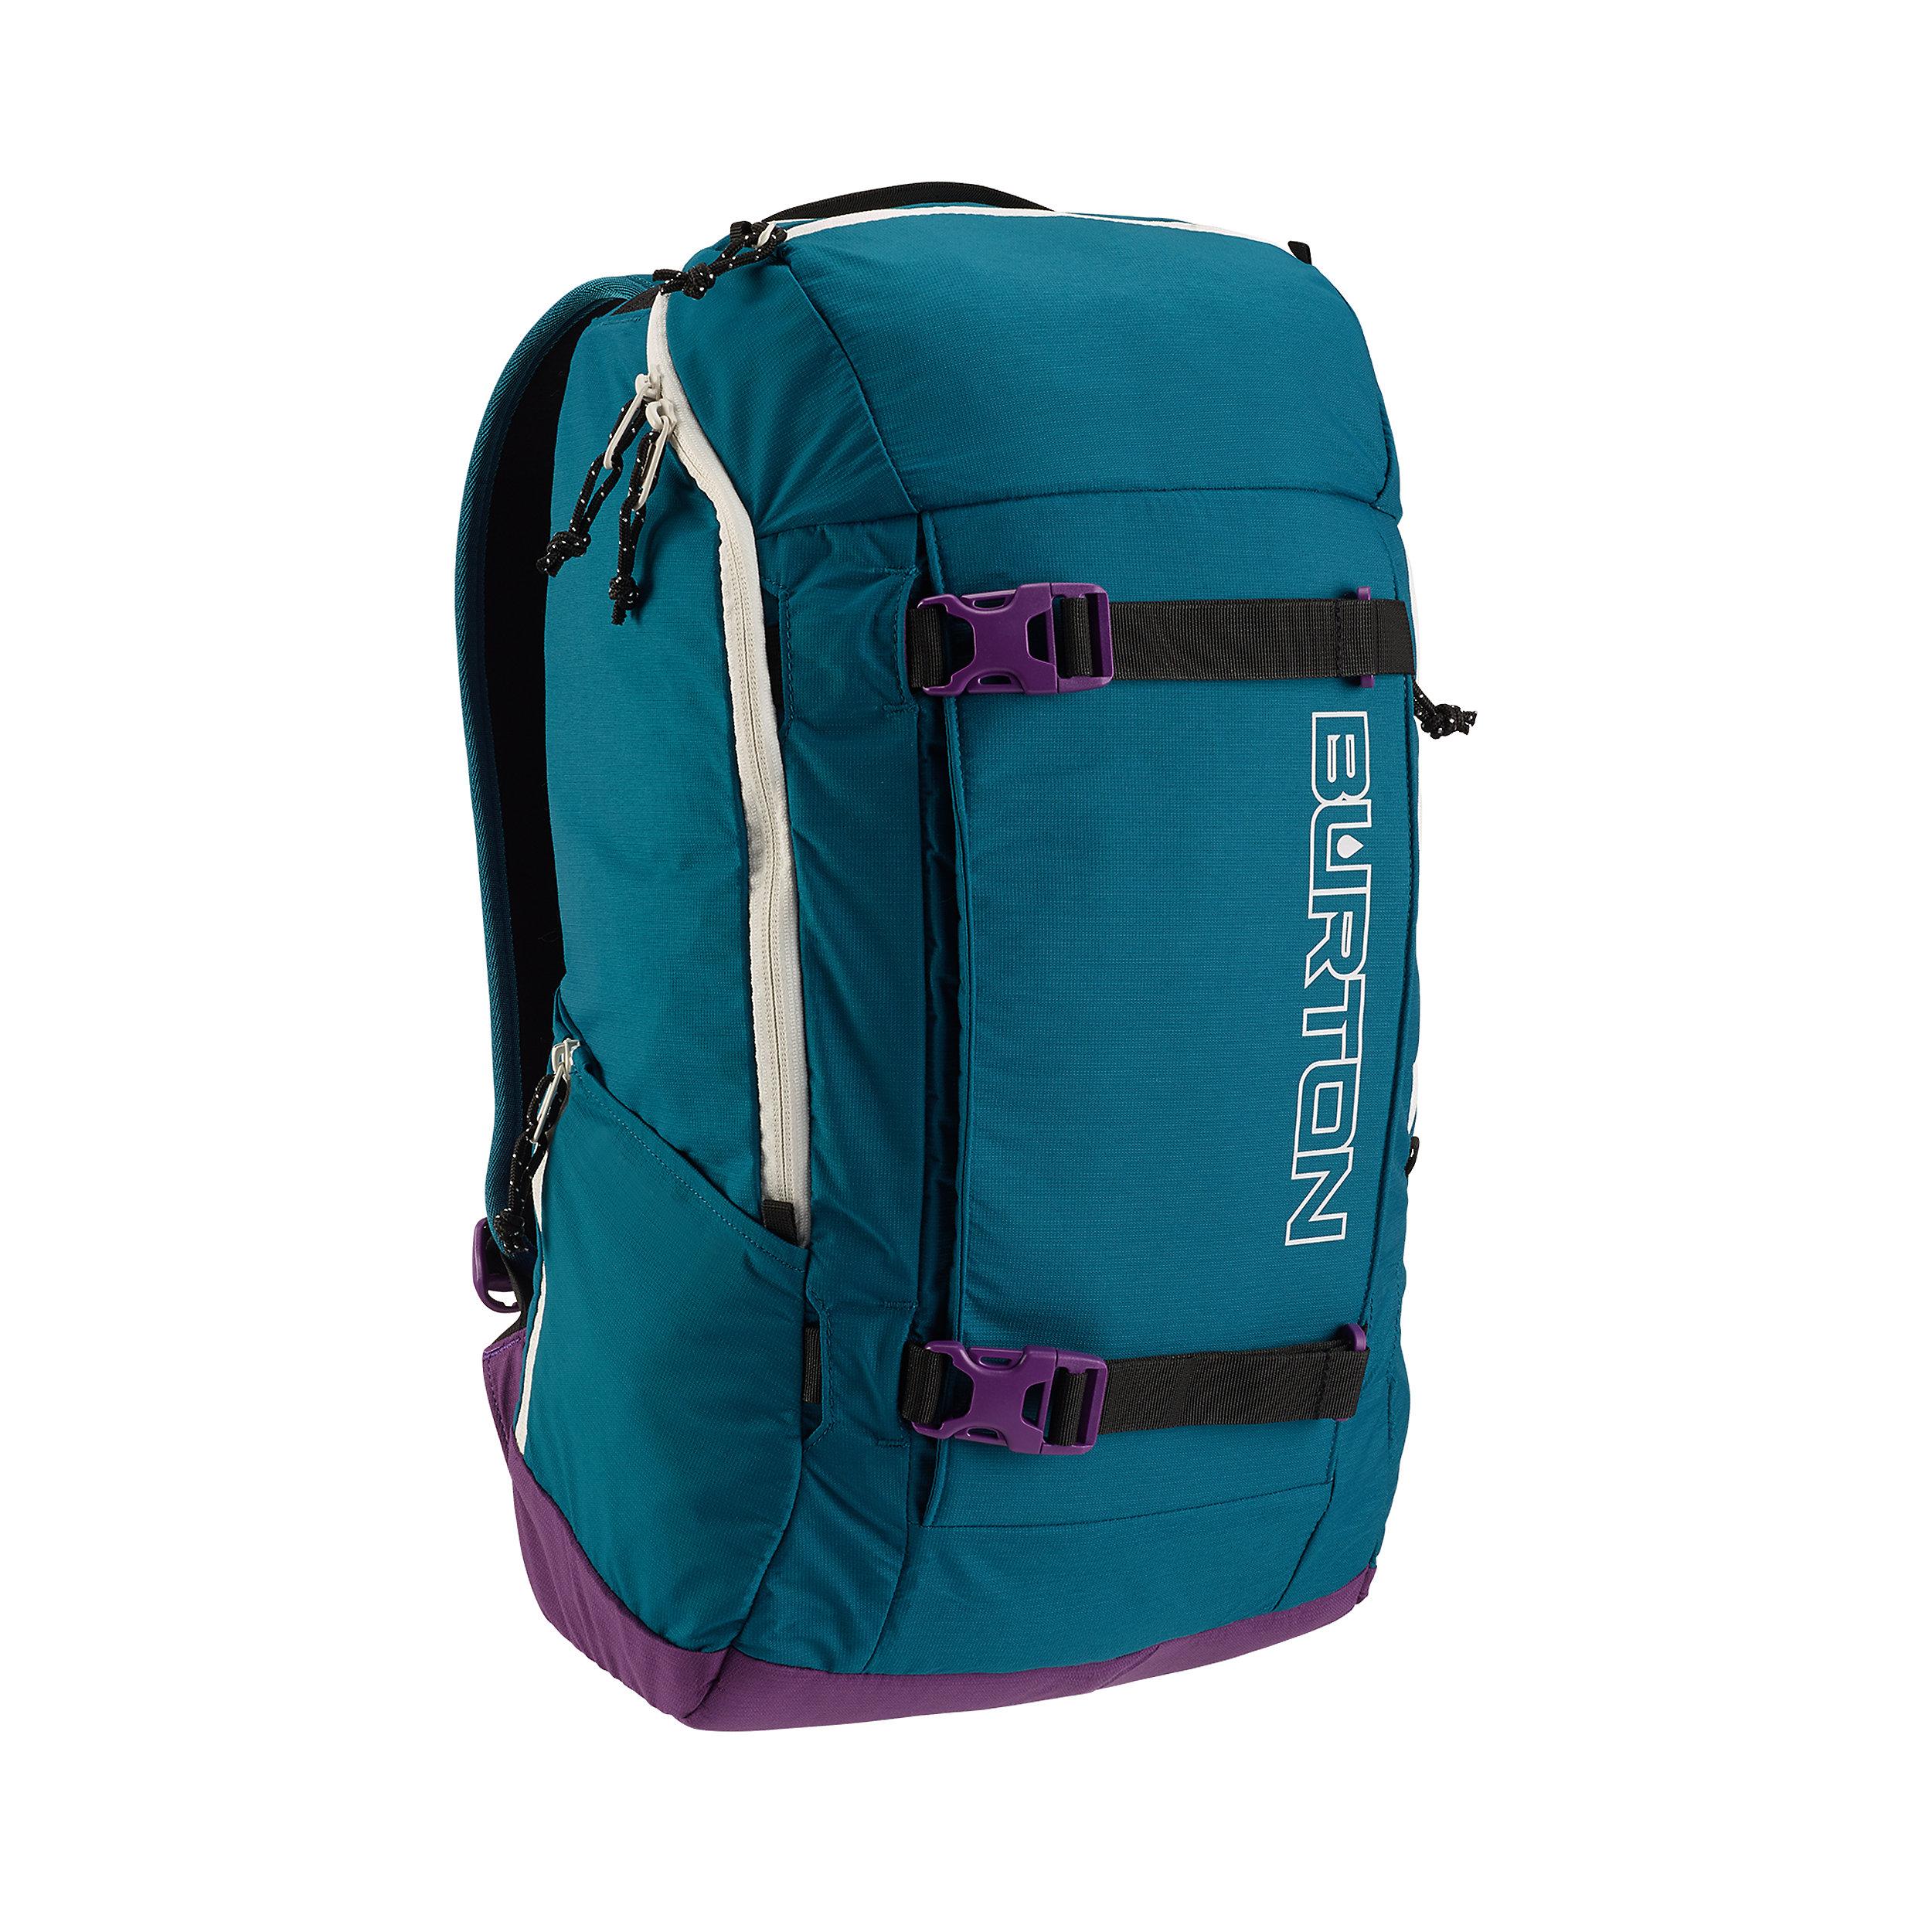 Backpack Kilo 2.0 Solution-Dyed 27 Liter